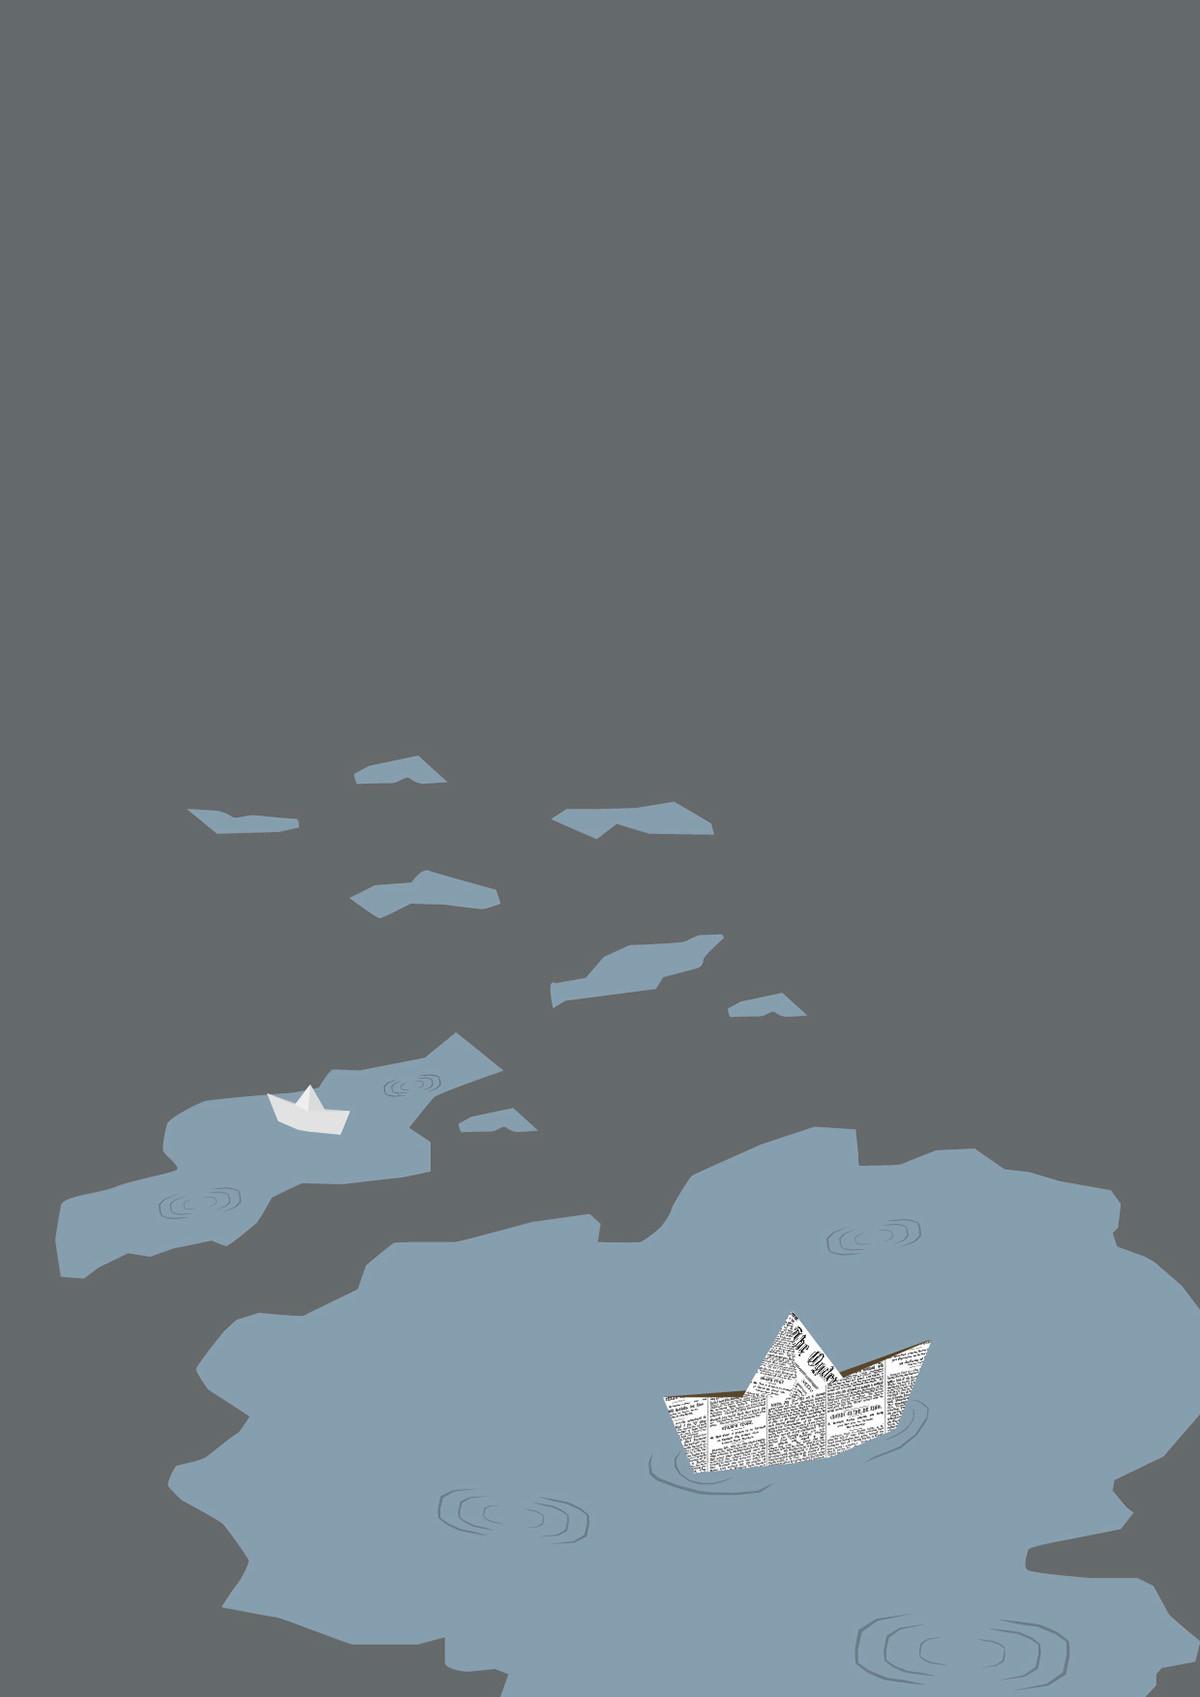 Rajesh sawant paper boat 2 01